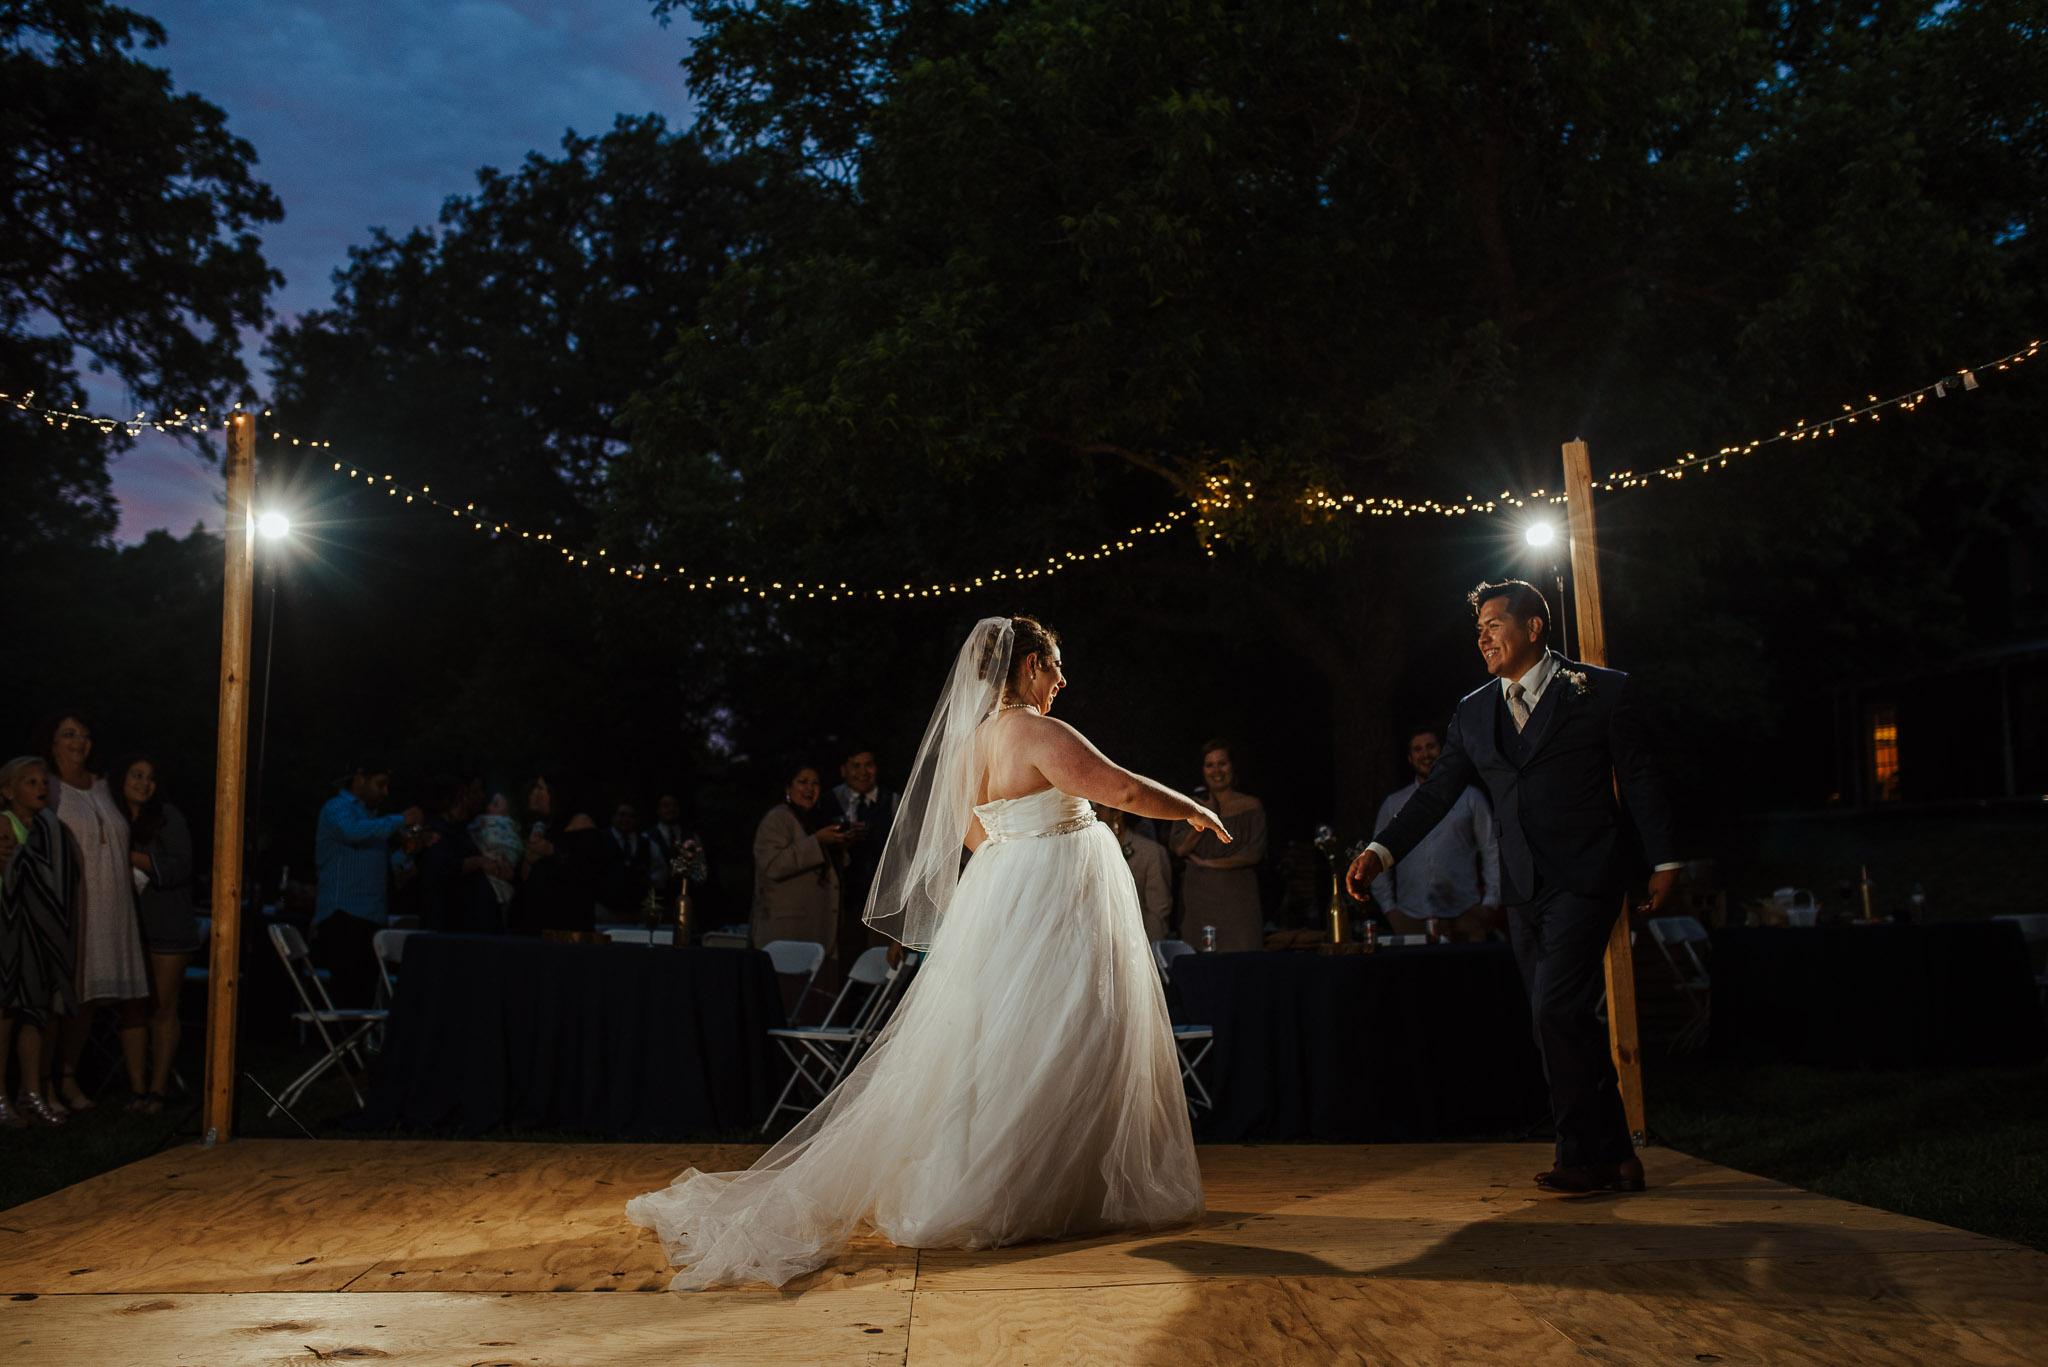 Christoval-Texas-Wedding_Photographer-Meghan&Tony-0034.jpg